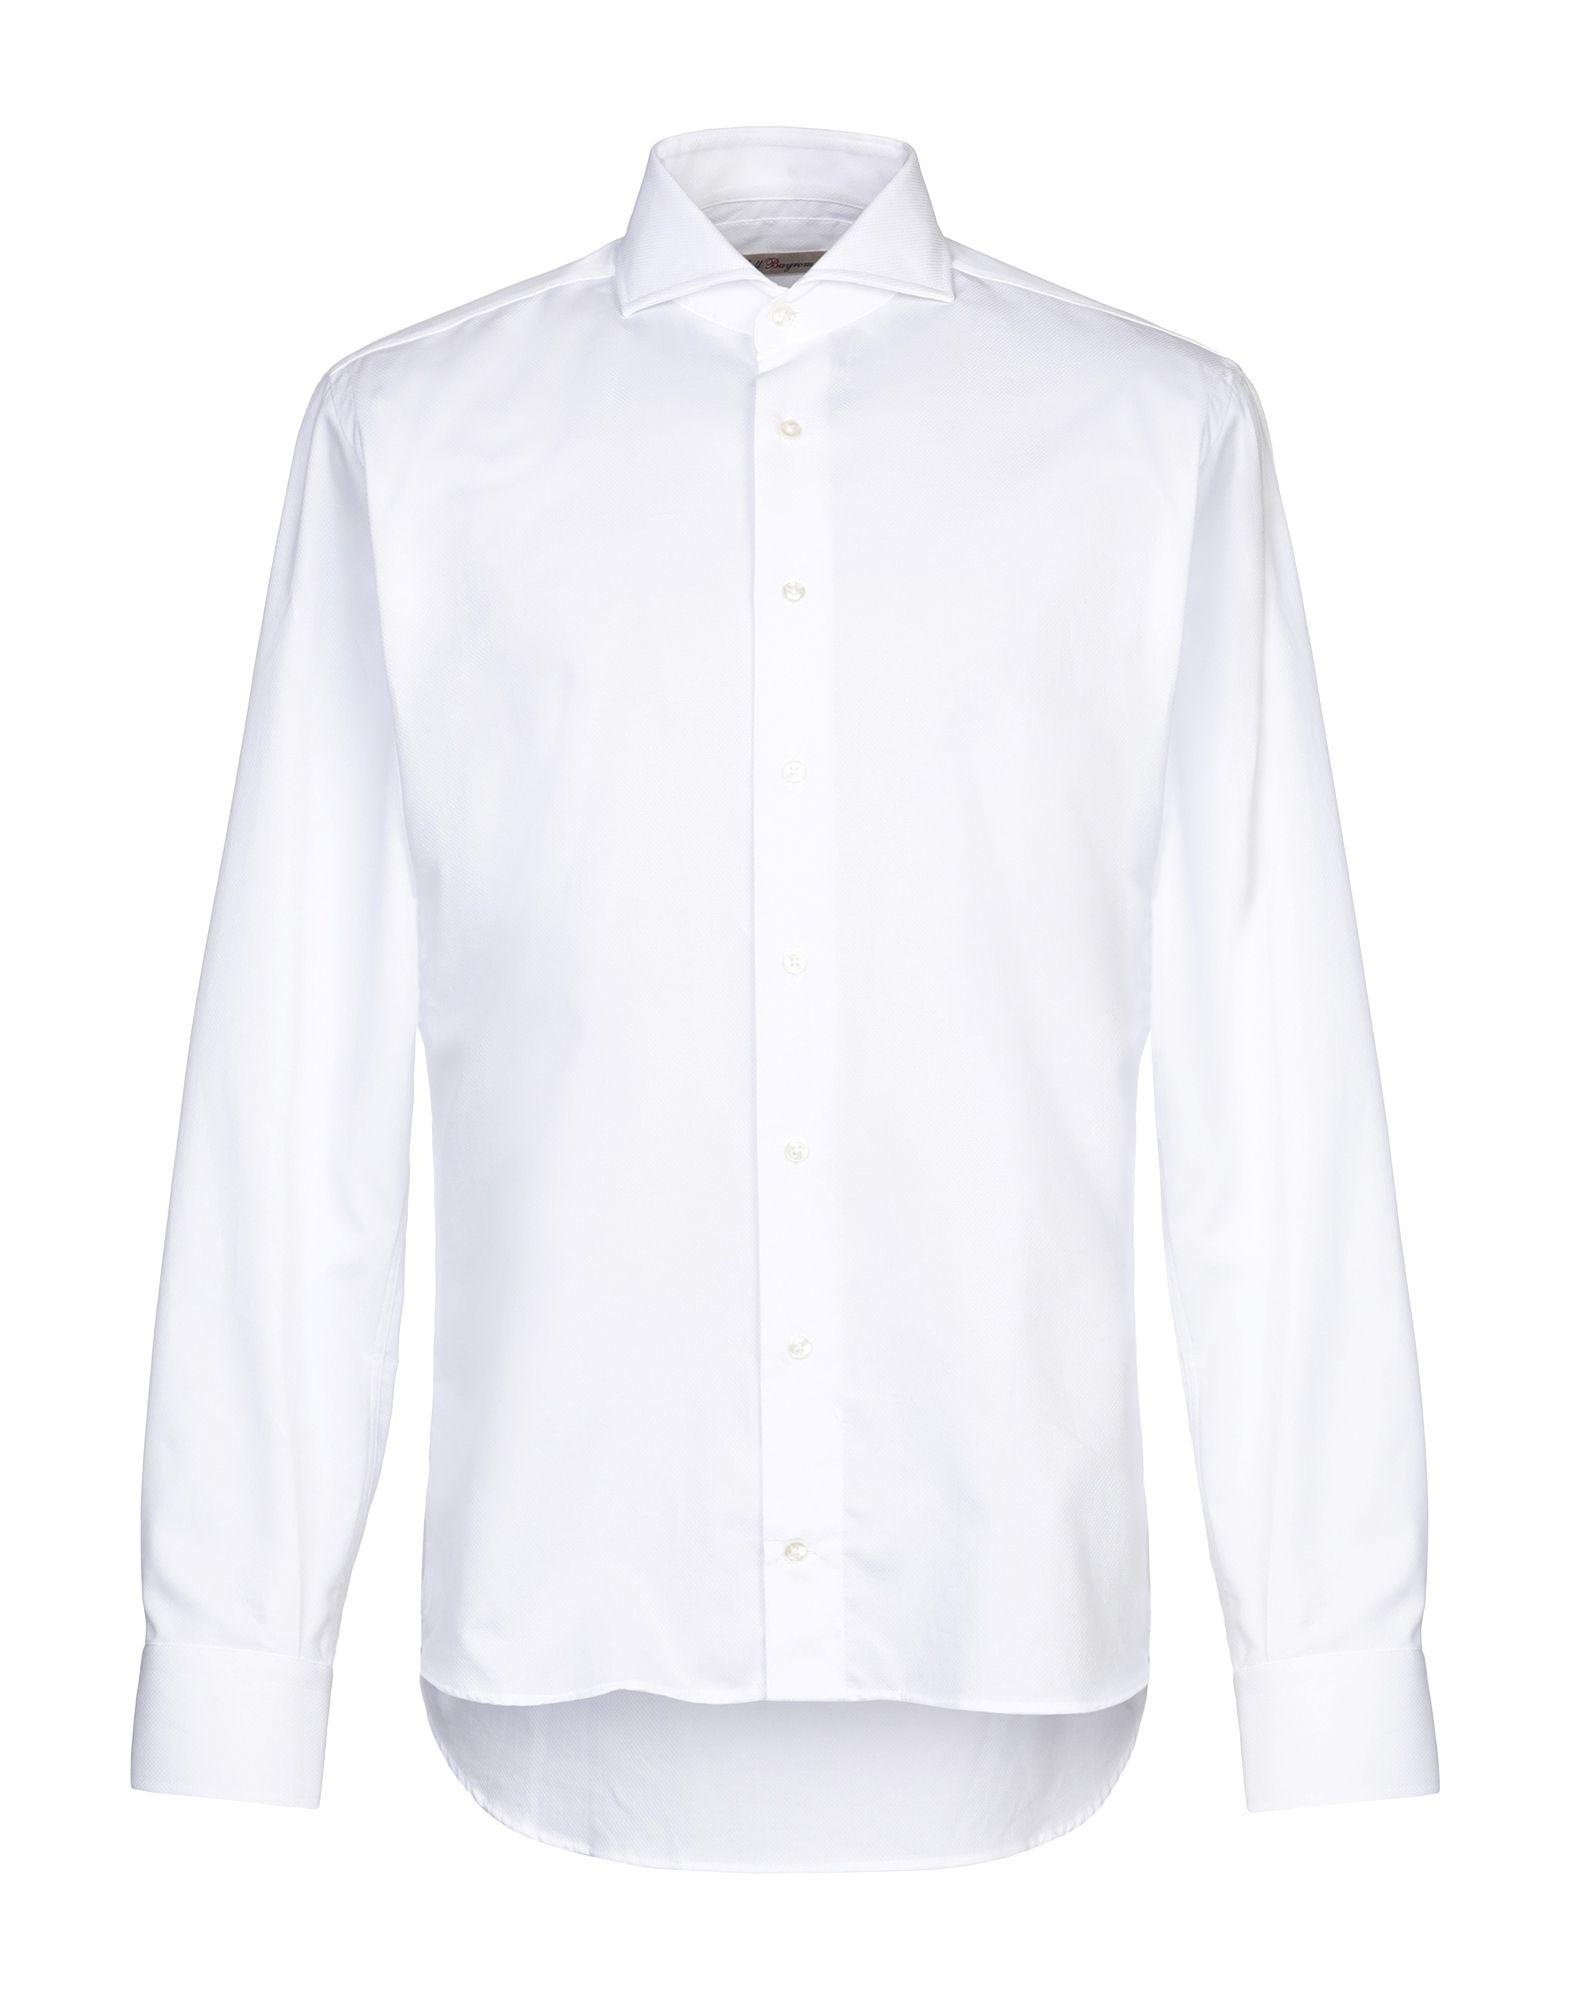 STELL BAYREM Pубашка